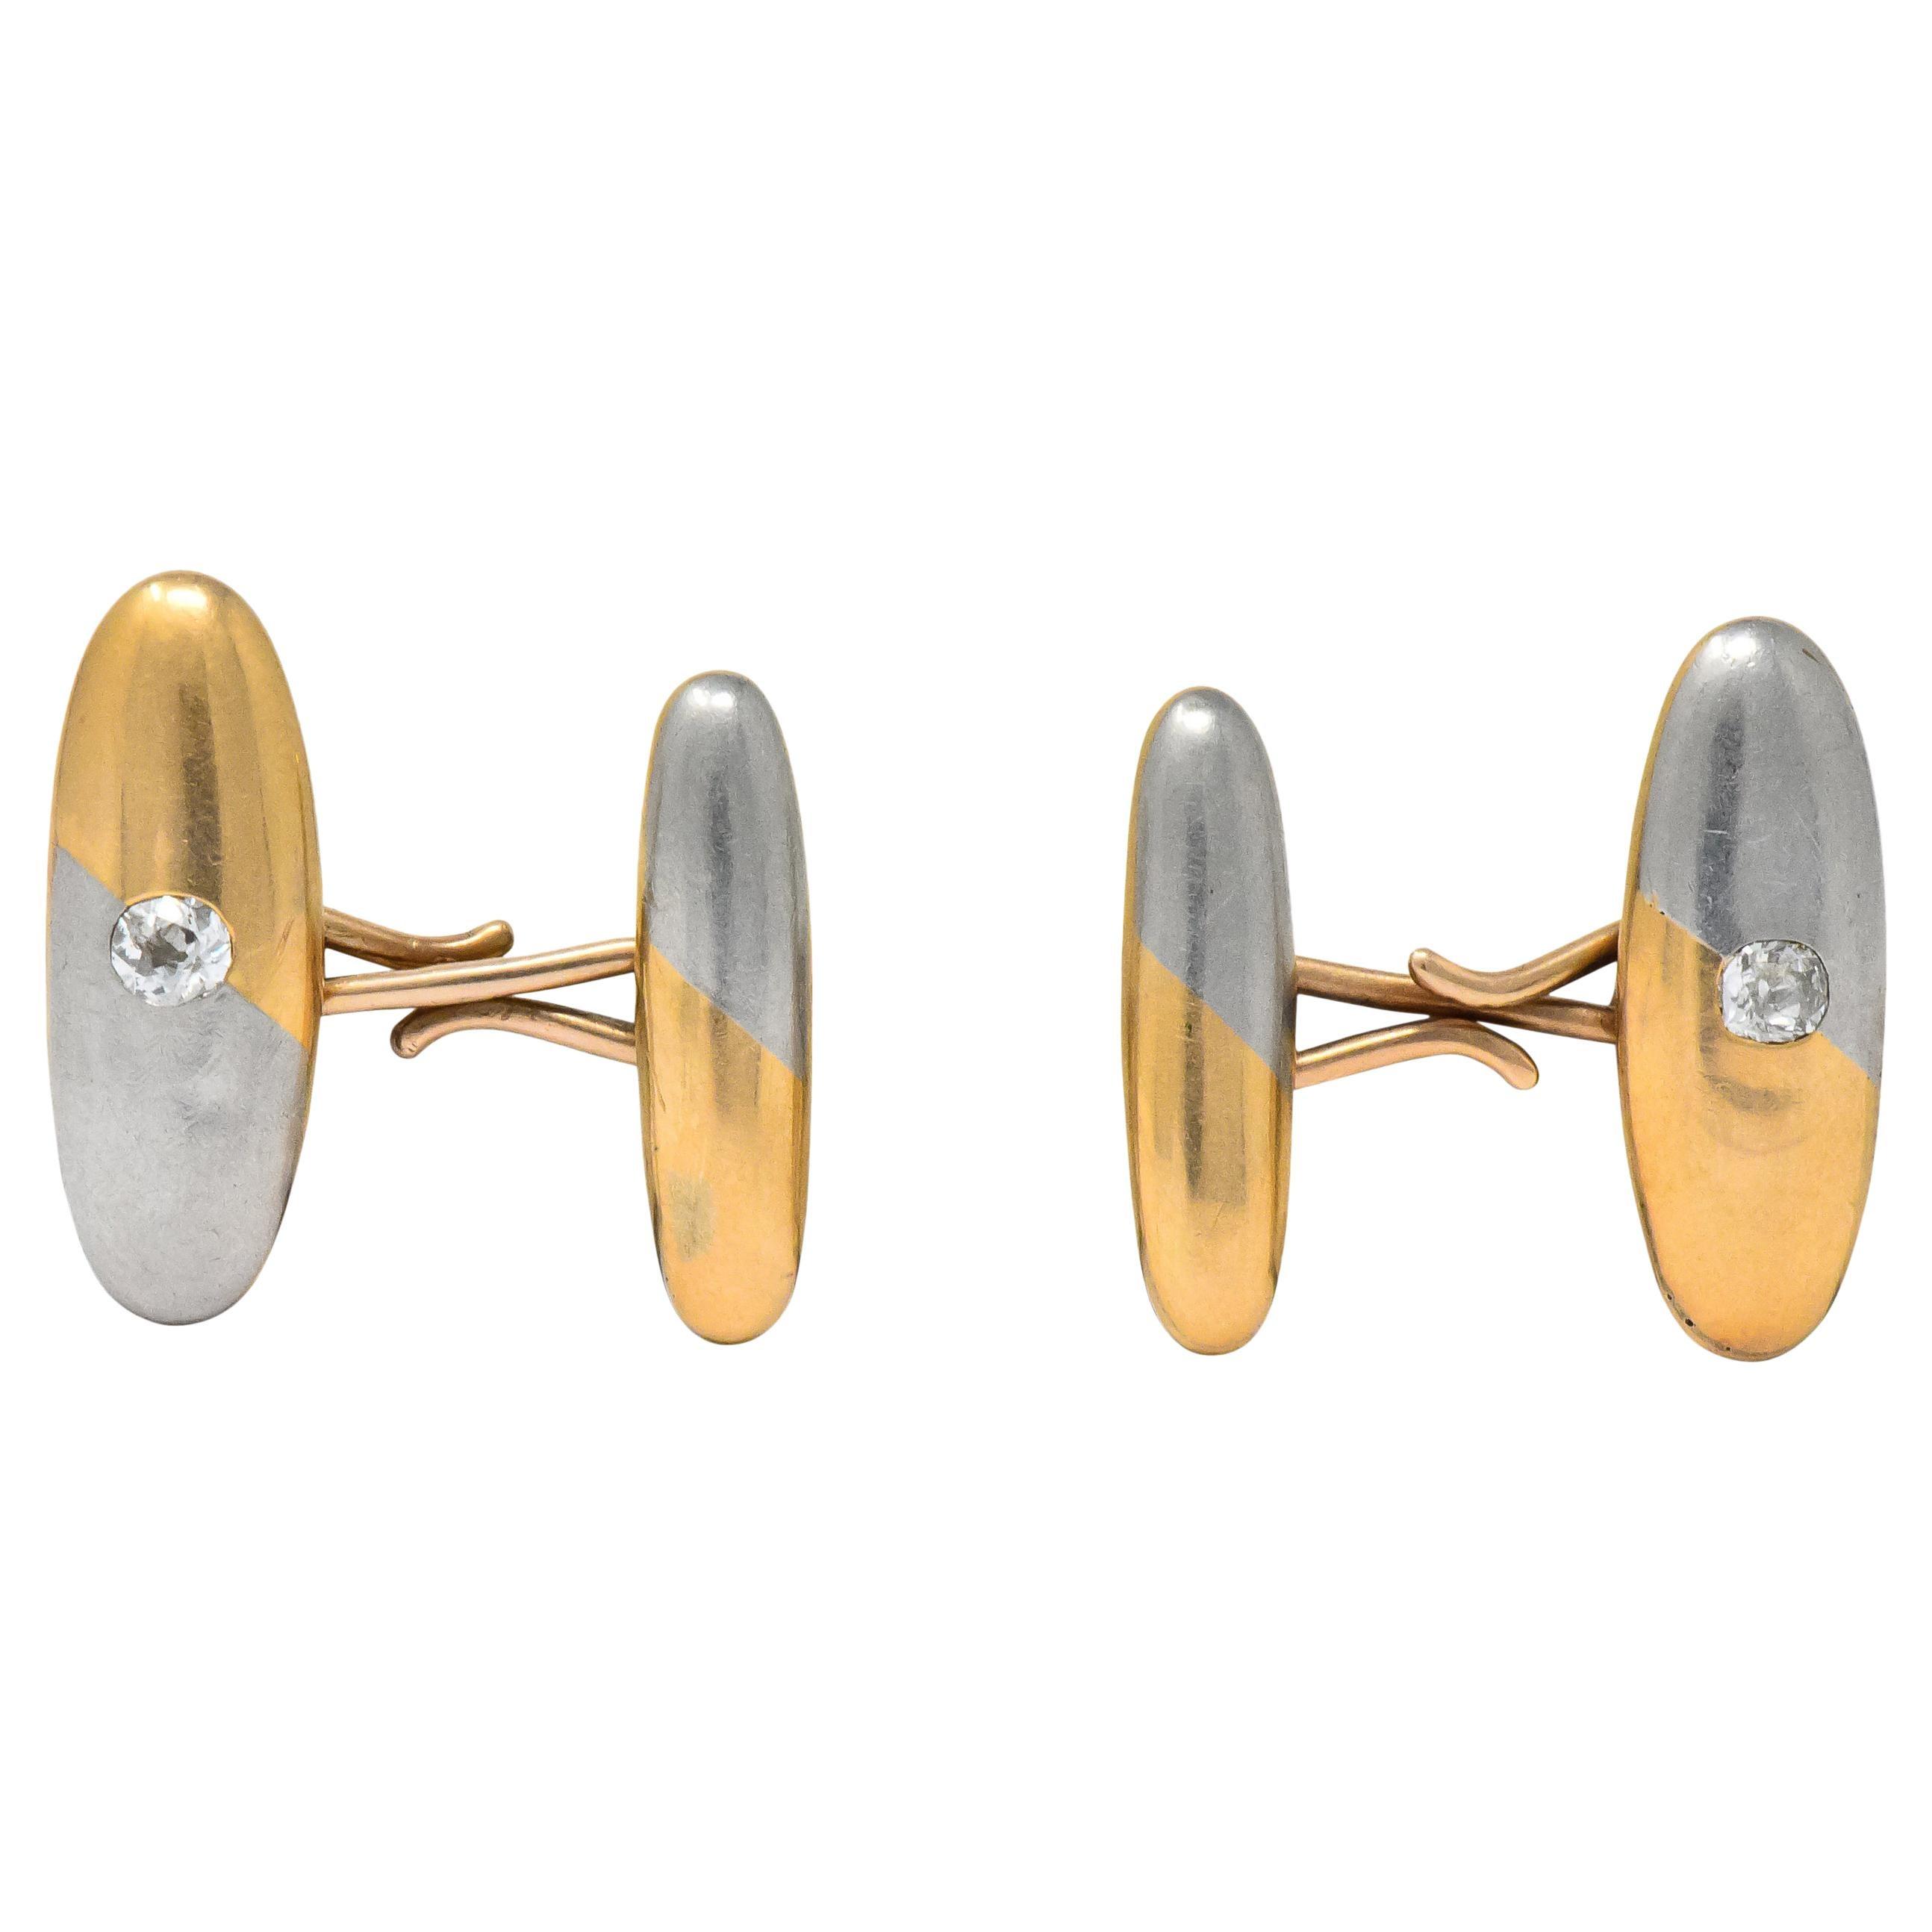 Antique 0.45 Carat Mine Diamond 14 Karat Gold Platinum Two-Tone Men's Cufflinks